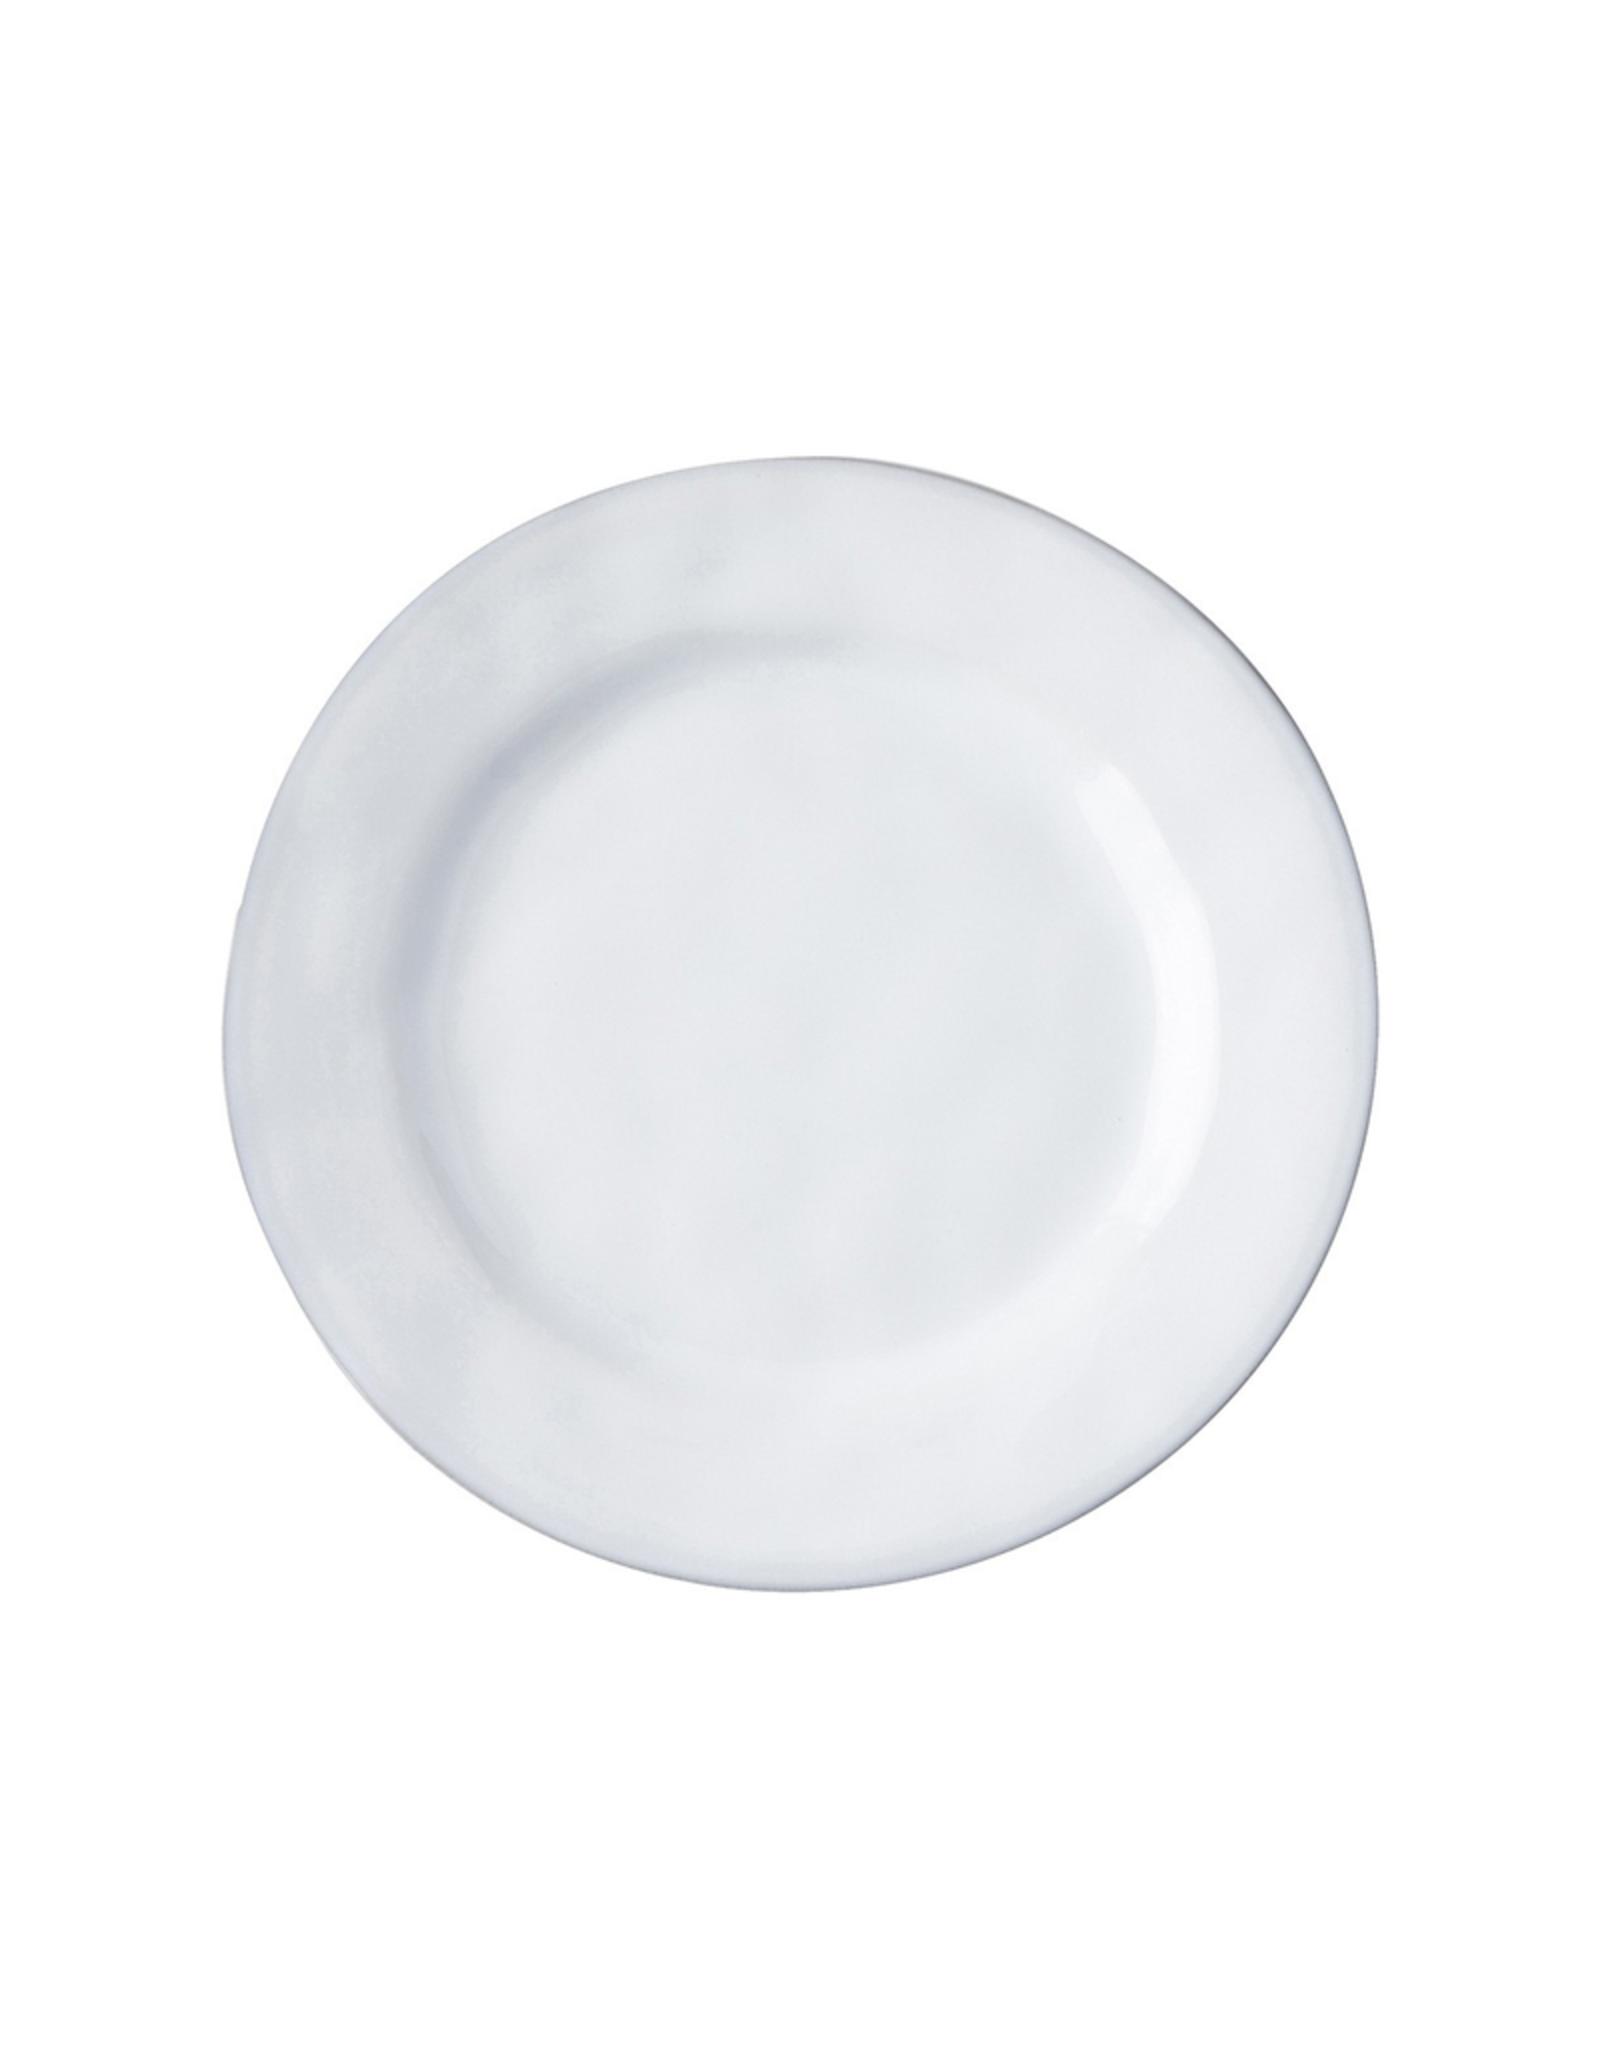 Juliska Quotidien Dessert/Salad Plate